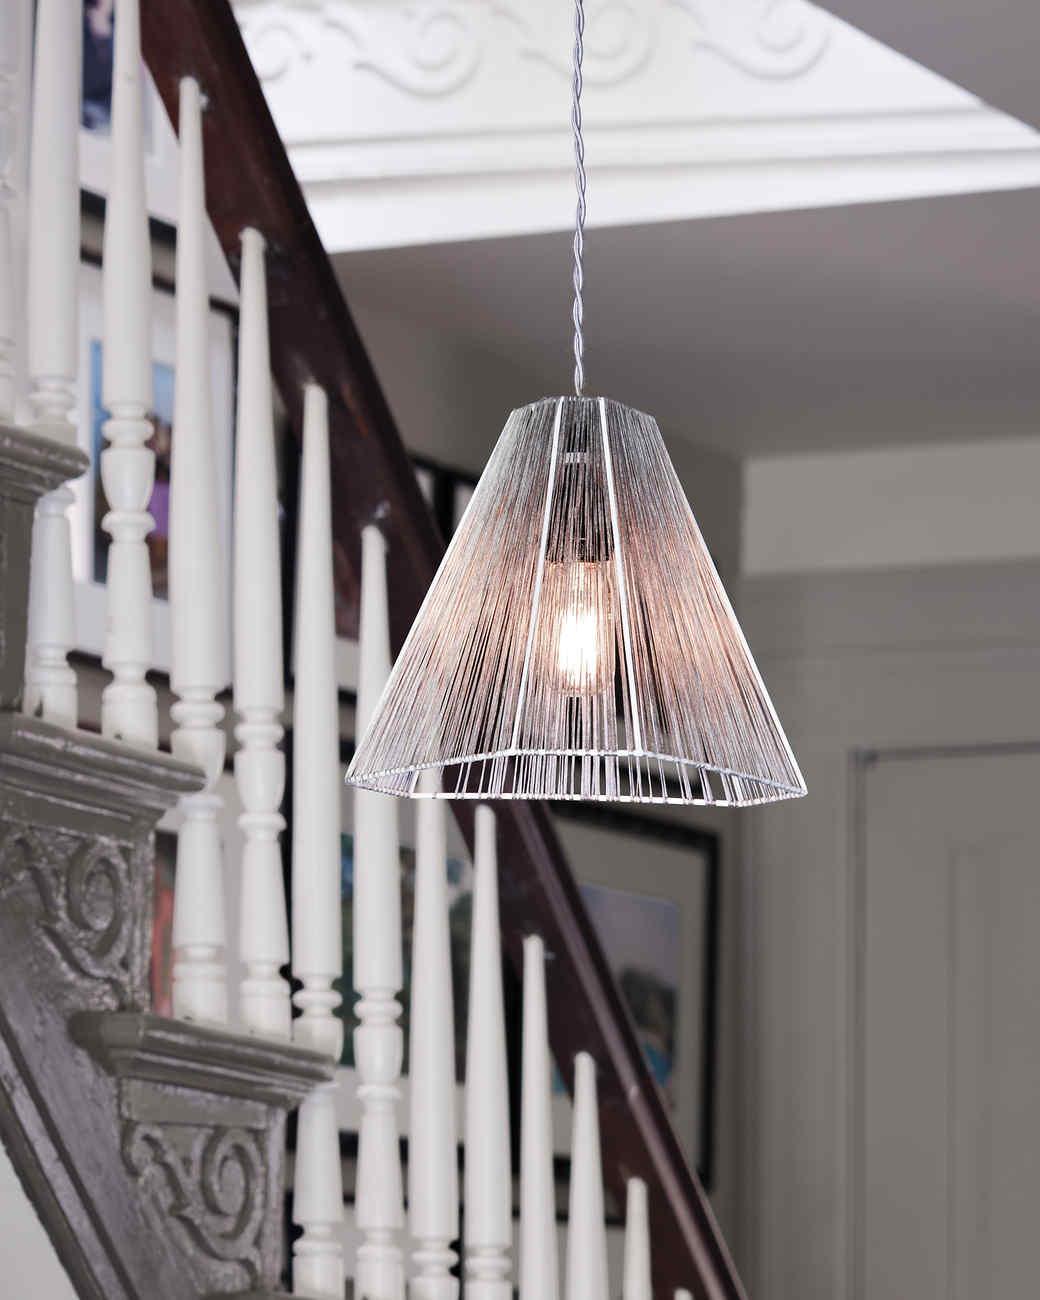 stringlamp-small-040-lamphalf-md110260.jpg